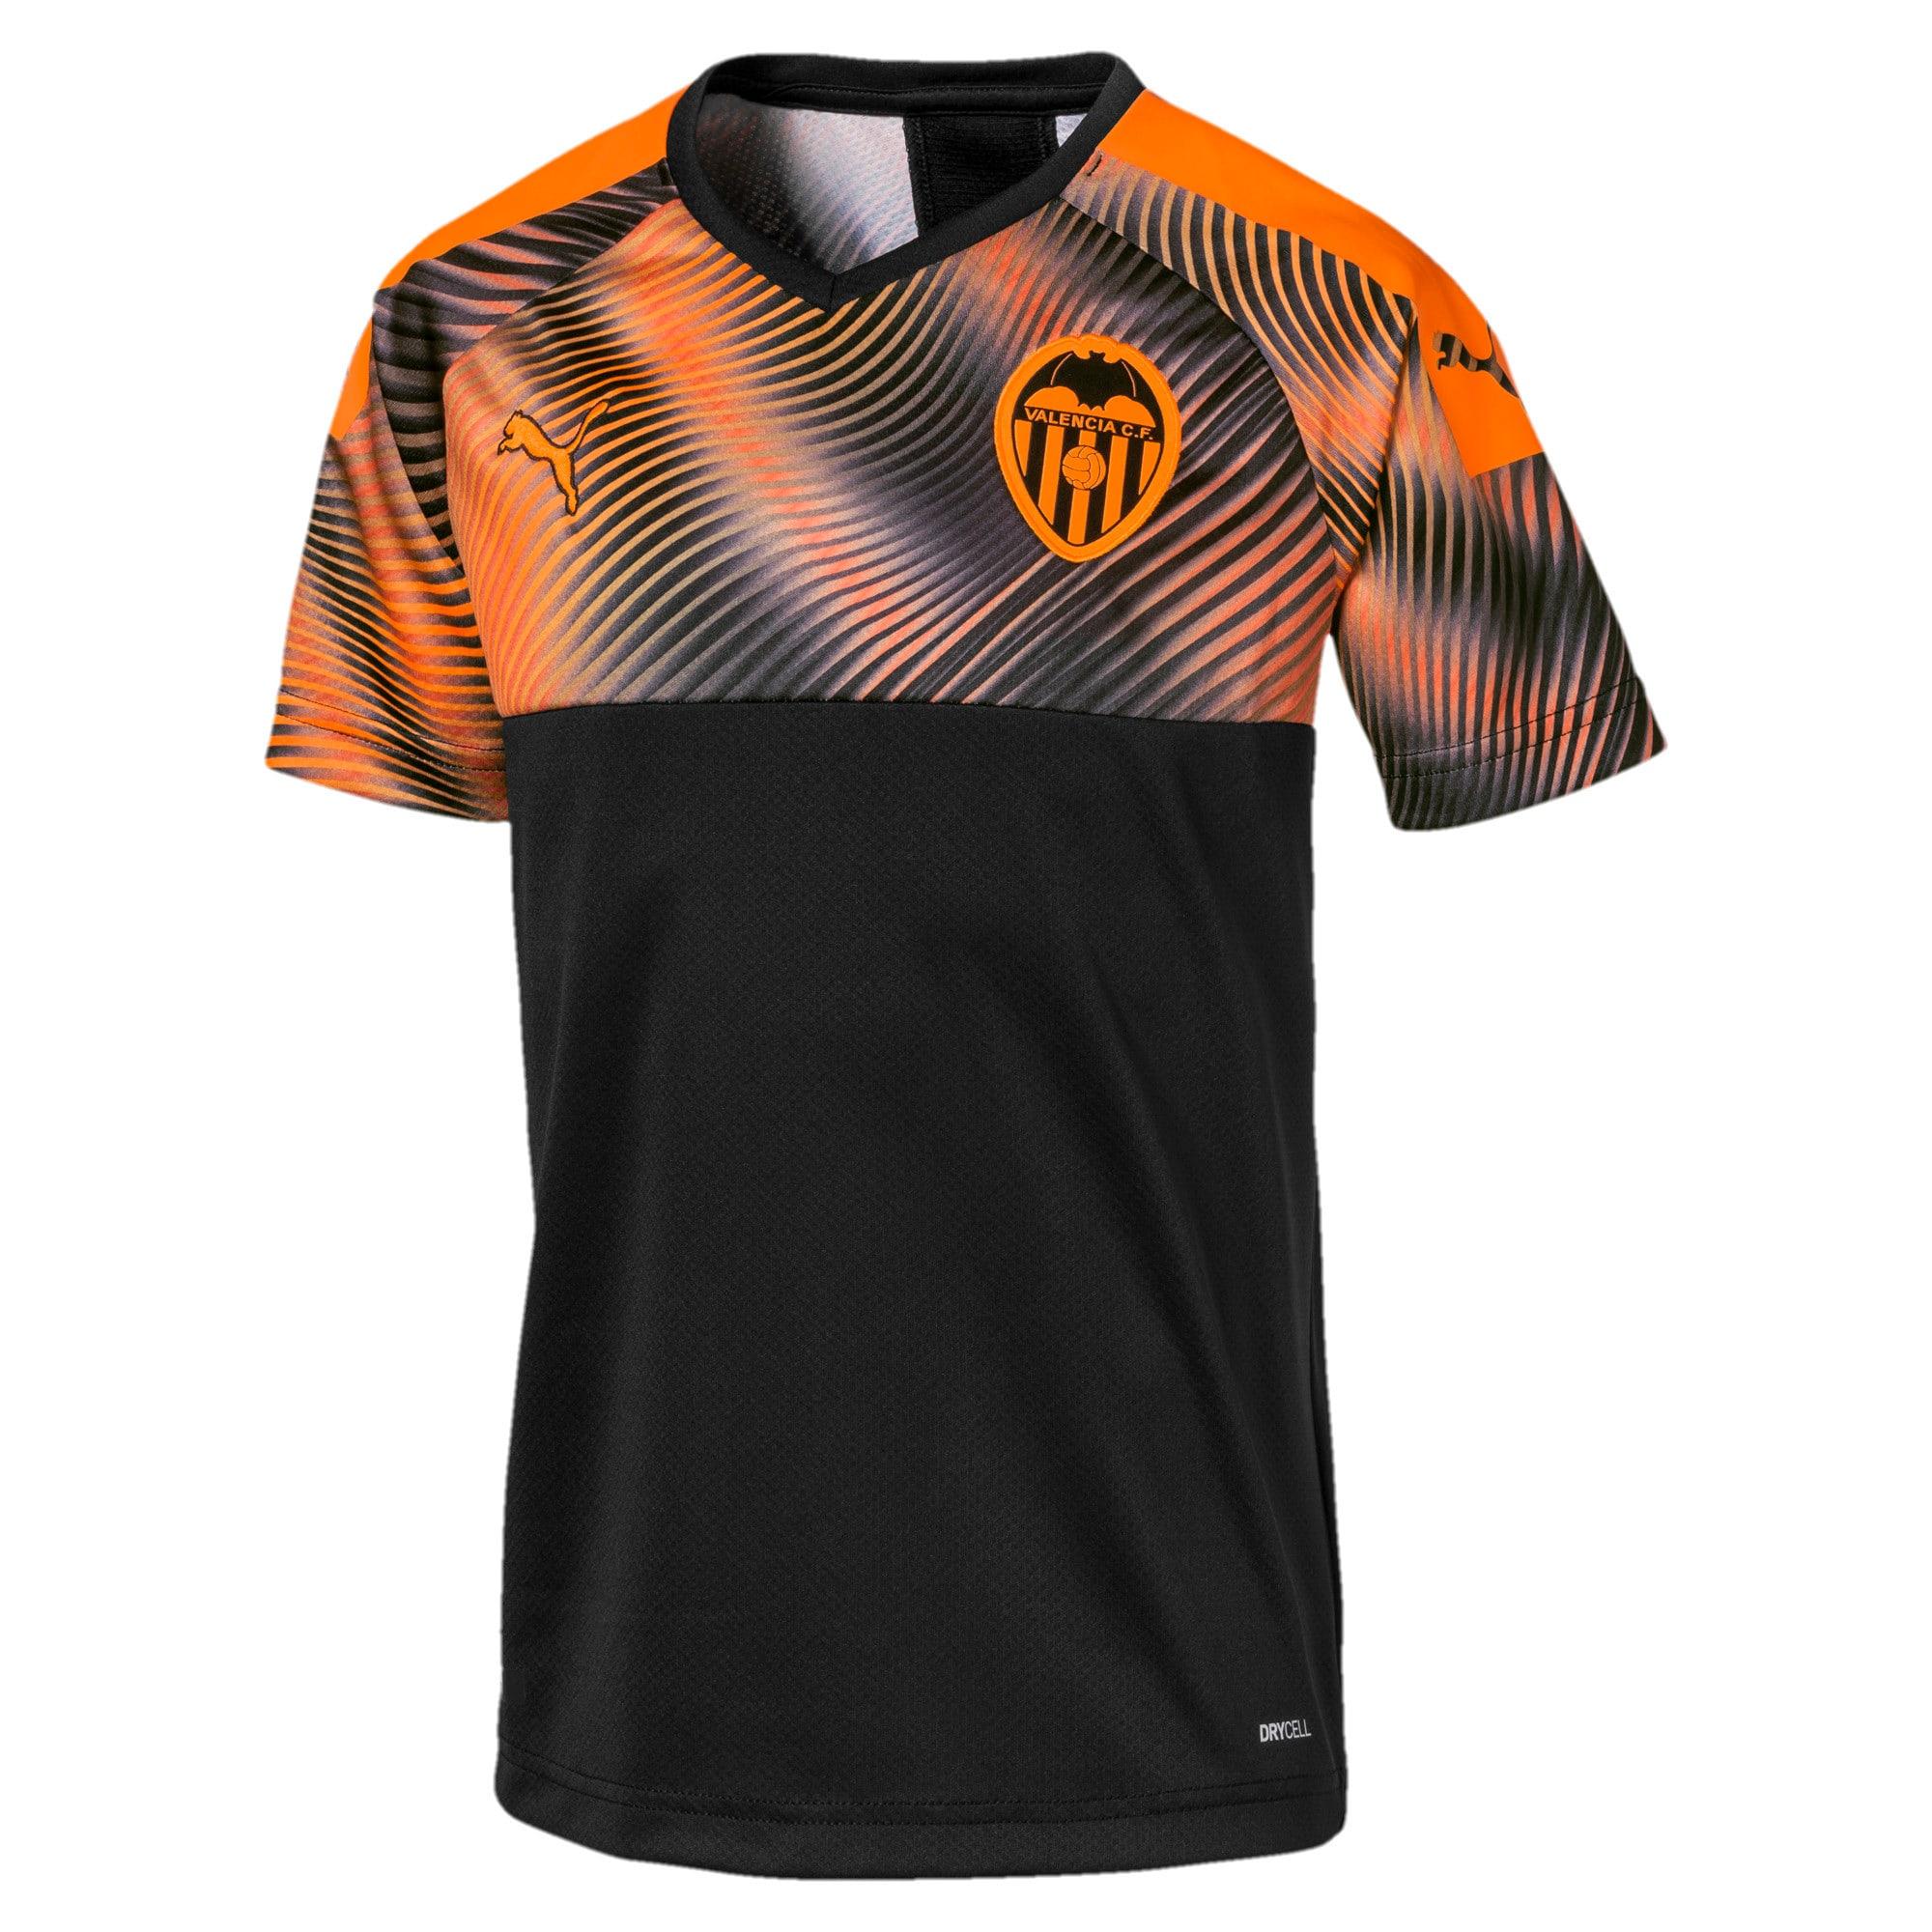 Thumbnail 1 of Valencia CF Away Replica Boys' Shirt, Puma Black-Vibrant Orange, medium